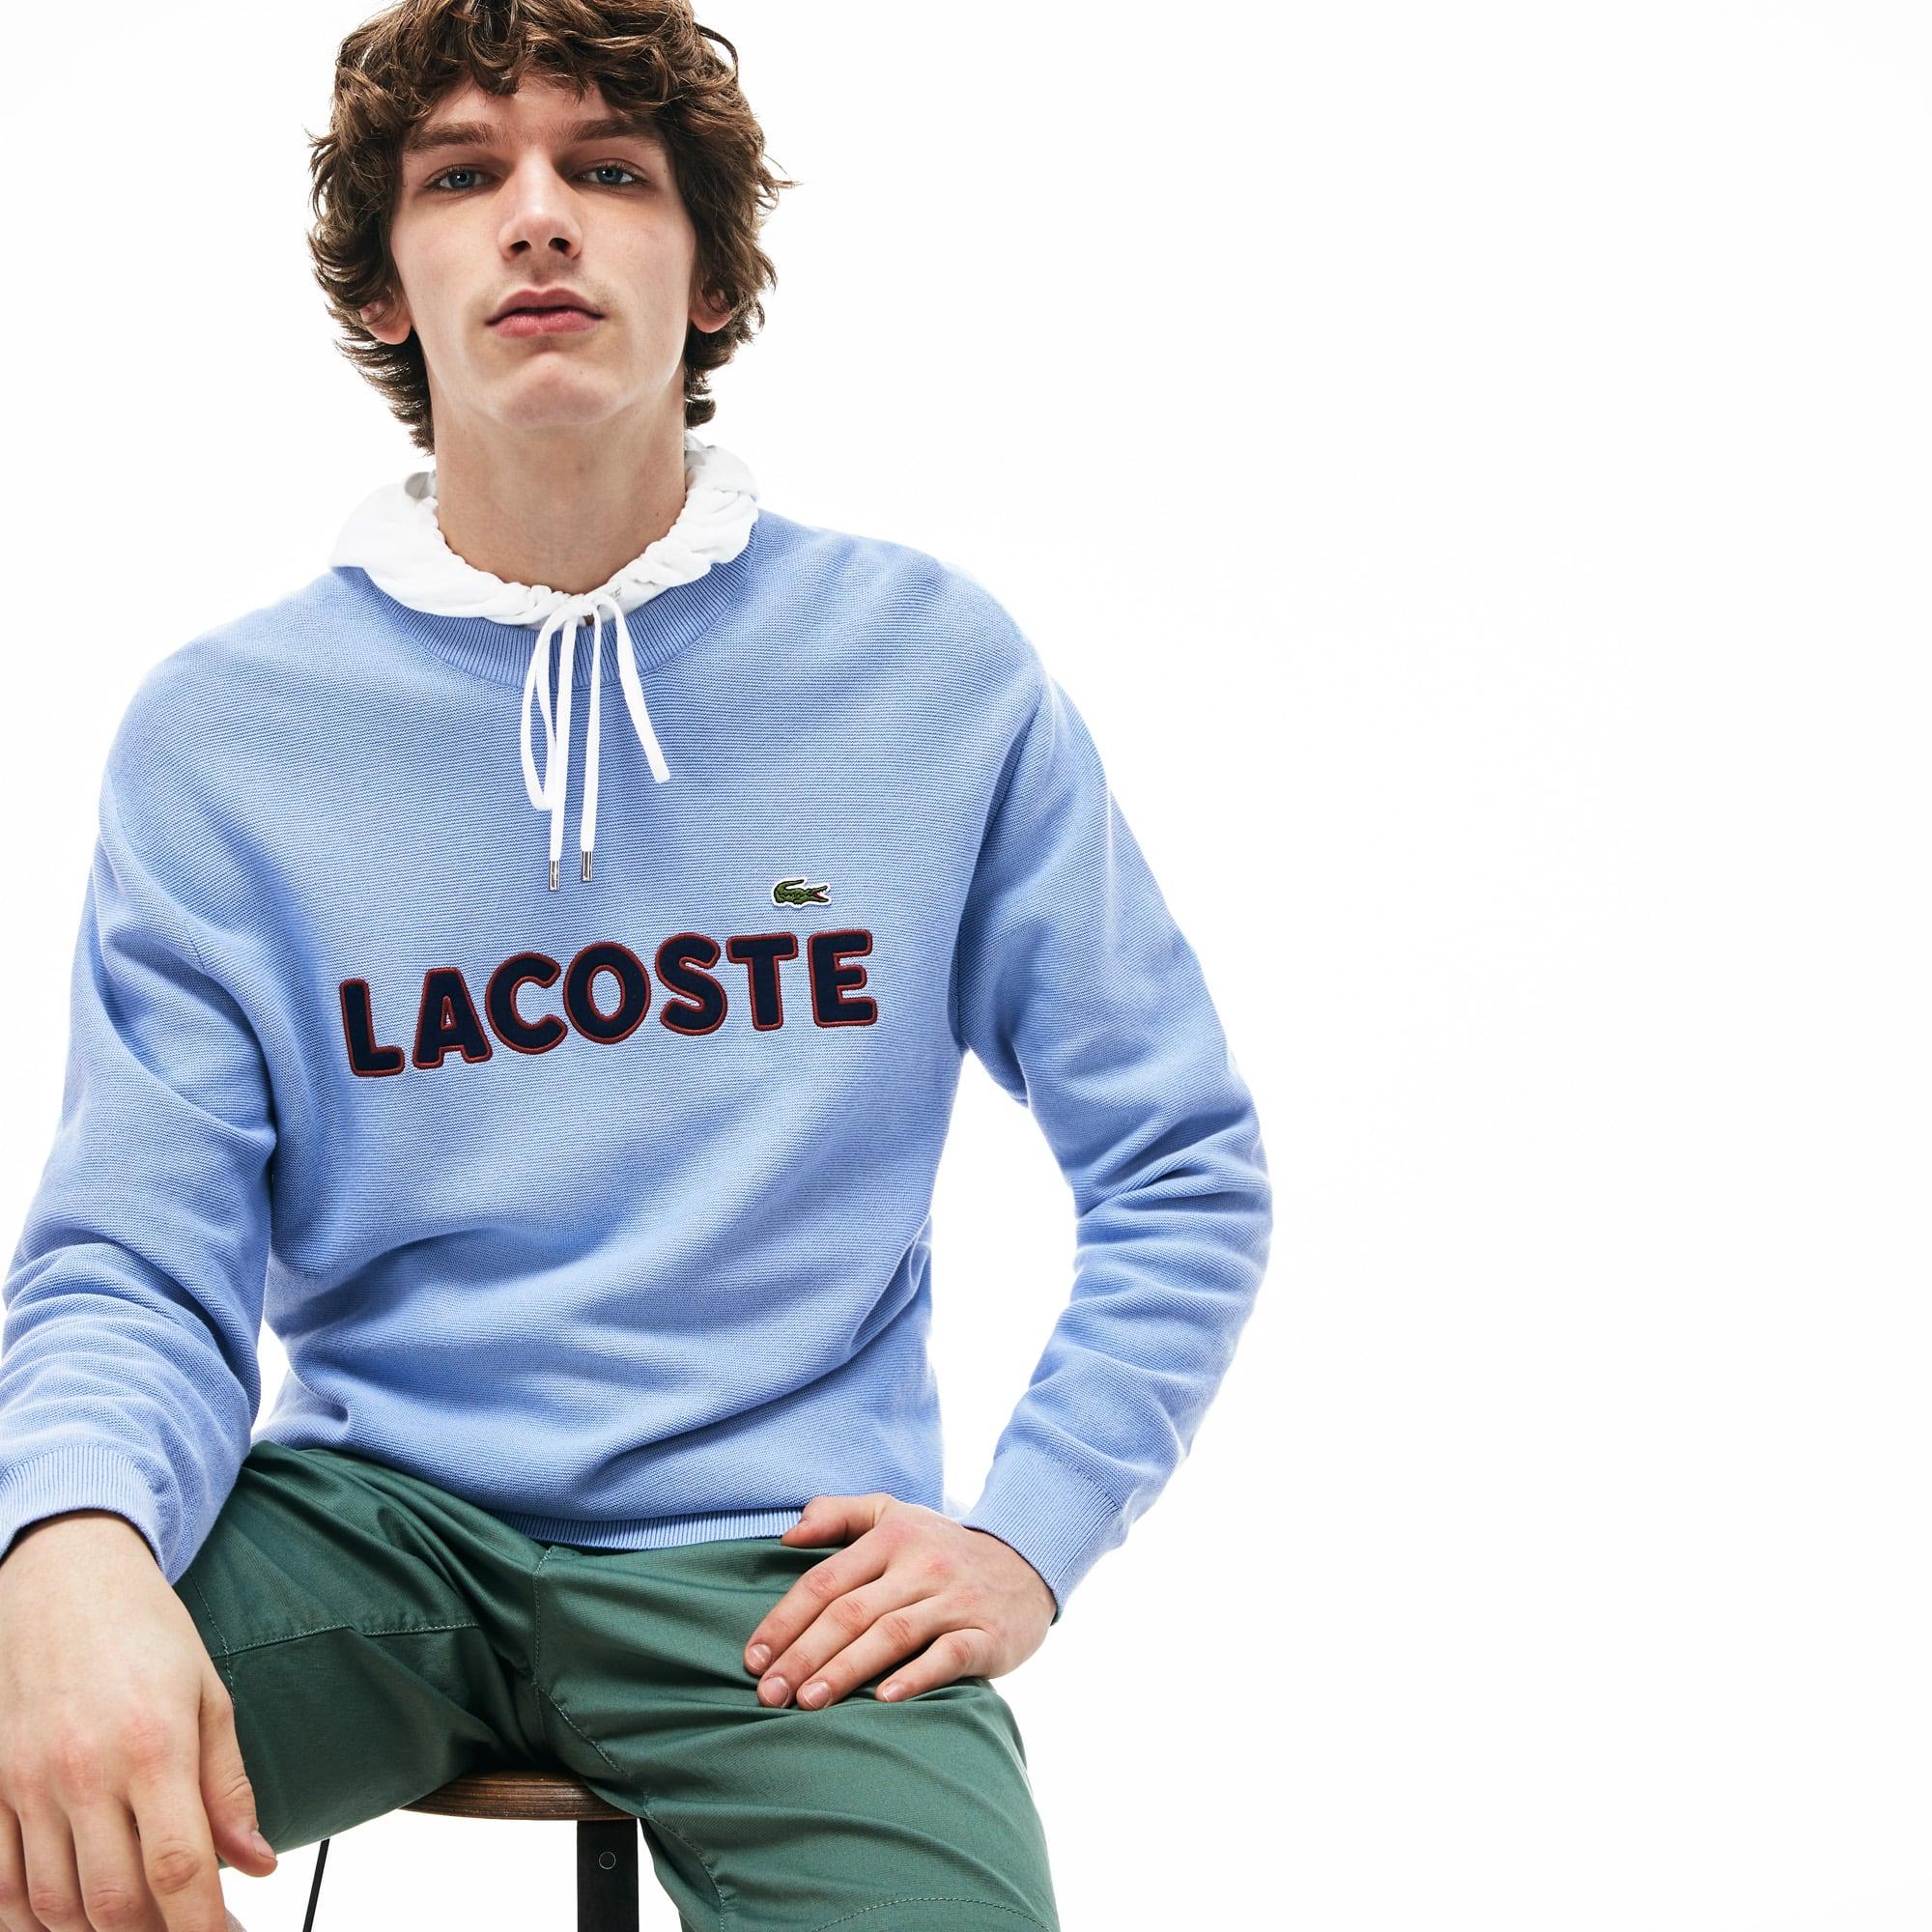 Men's Crew Neck Cotton Sweater